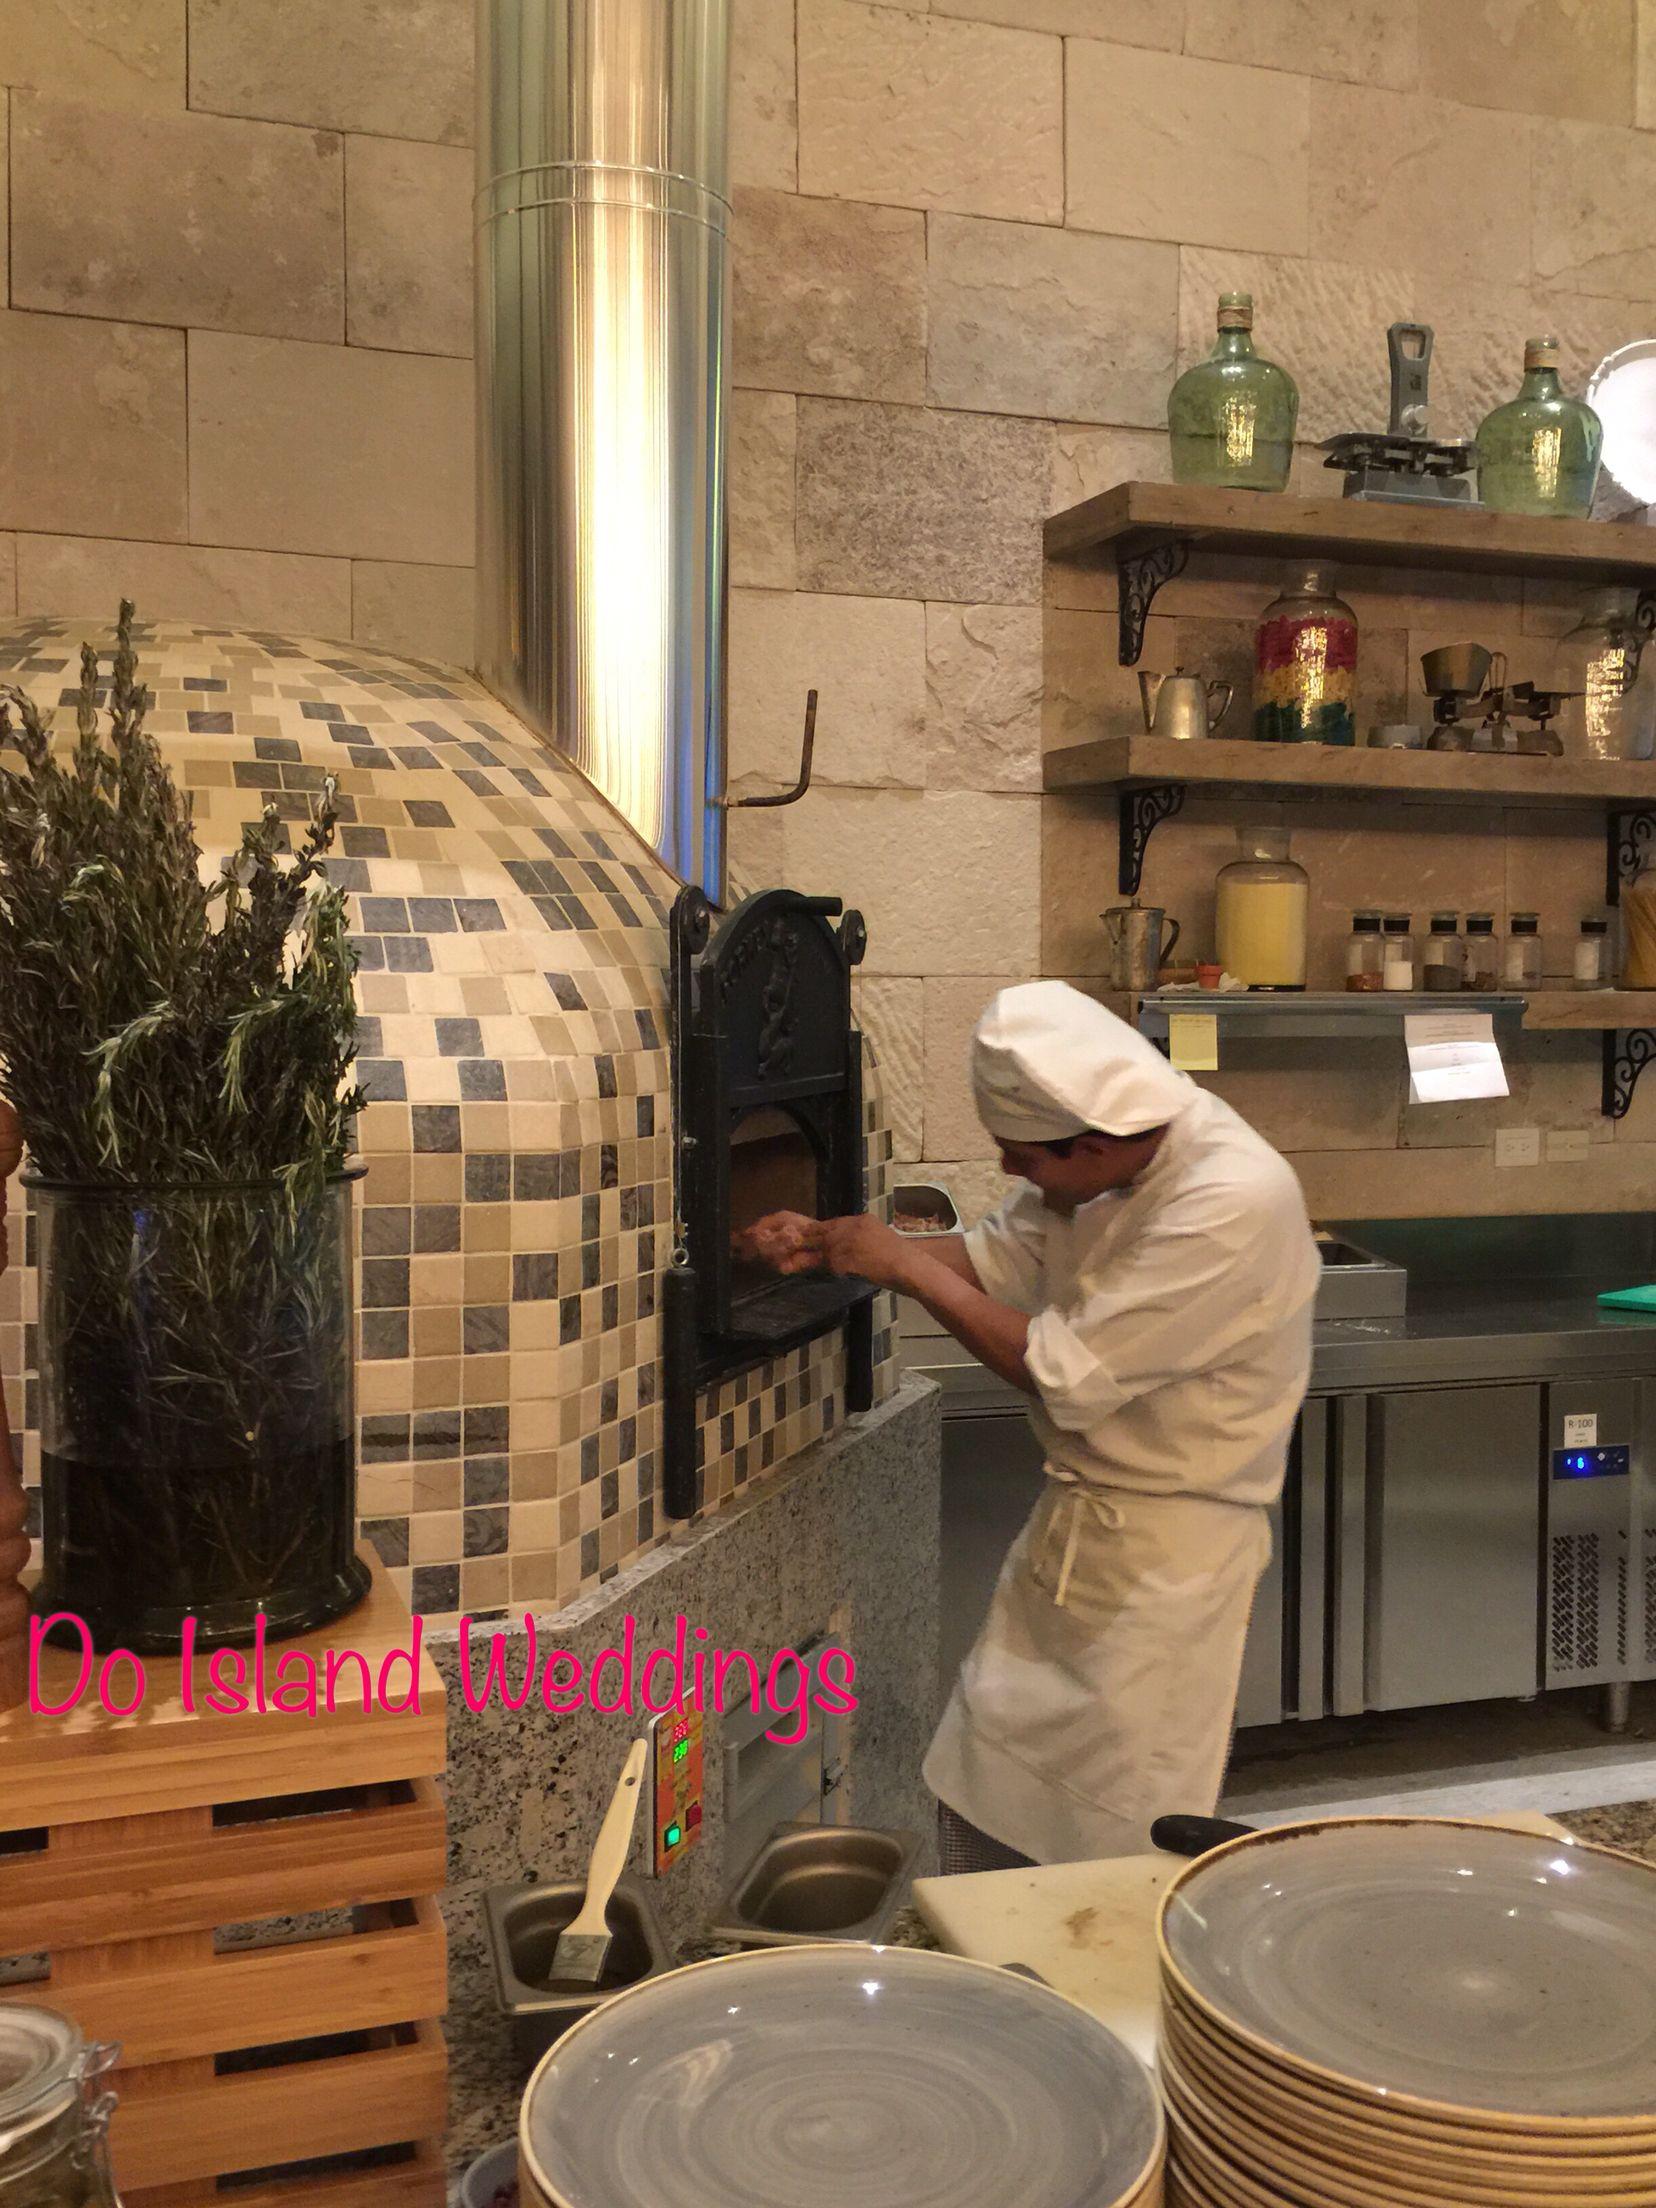 Lorenzo's Italian Restaurant  #hyattzivacancun #handtossedpizza #hyattallin #evolutionofallinclusive #idoislandweddings